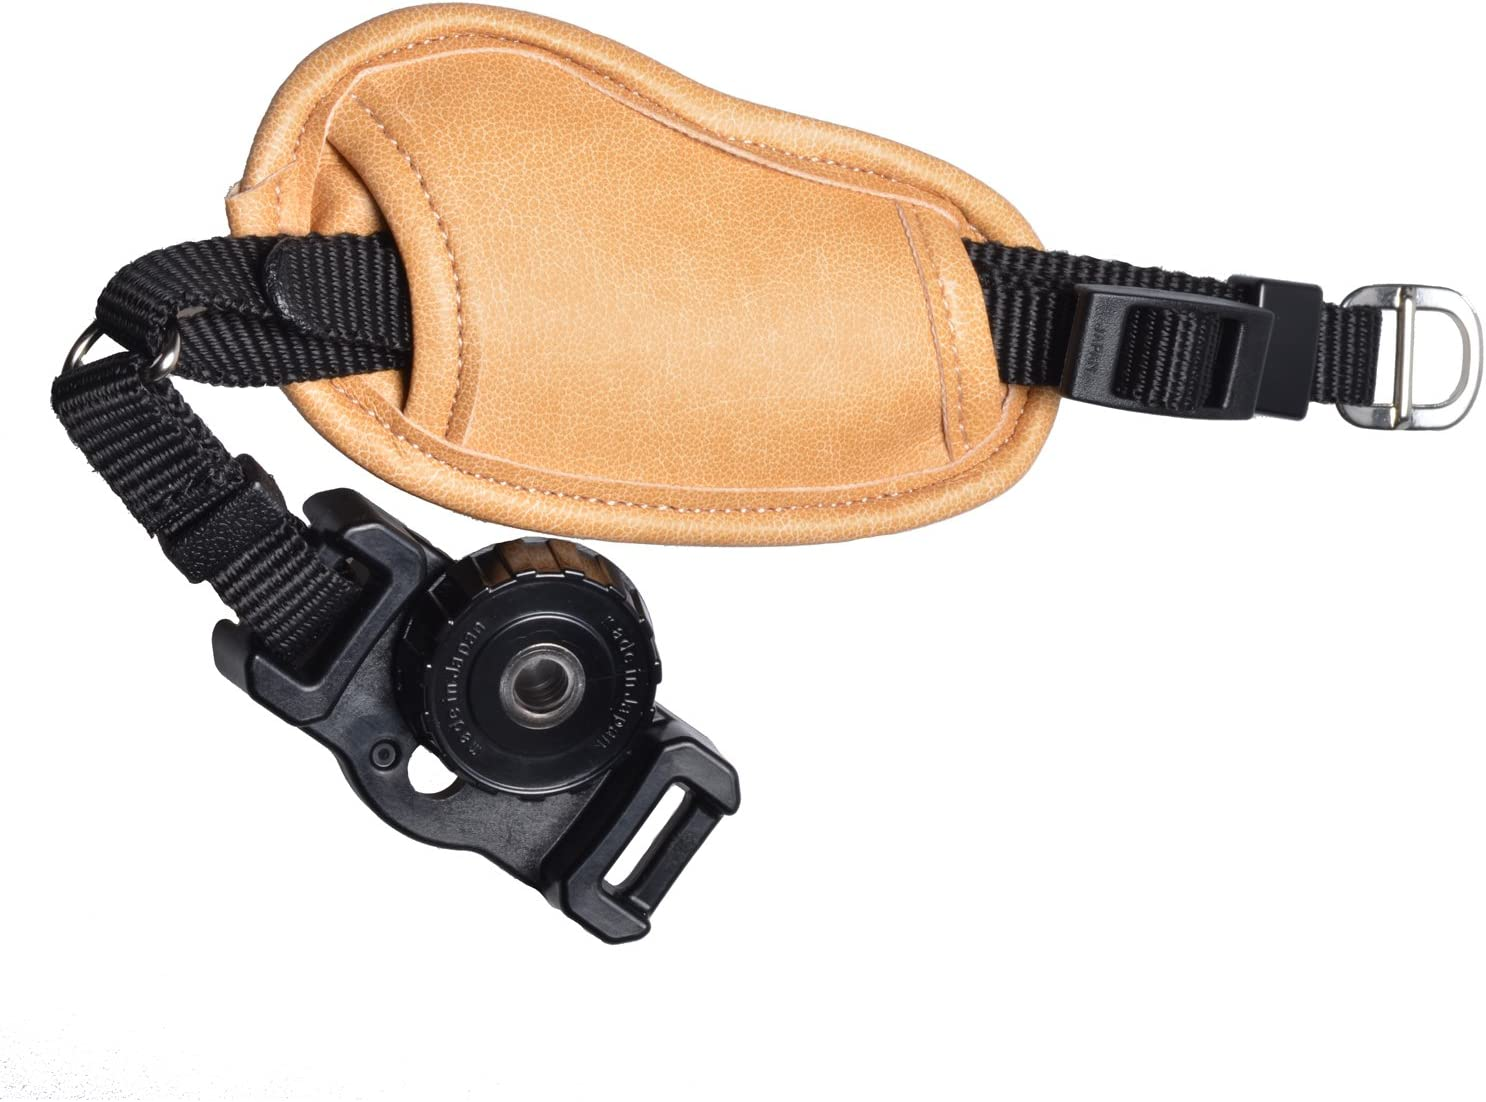 Kenko grip strap two Gill camera Gris